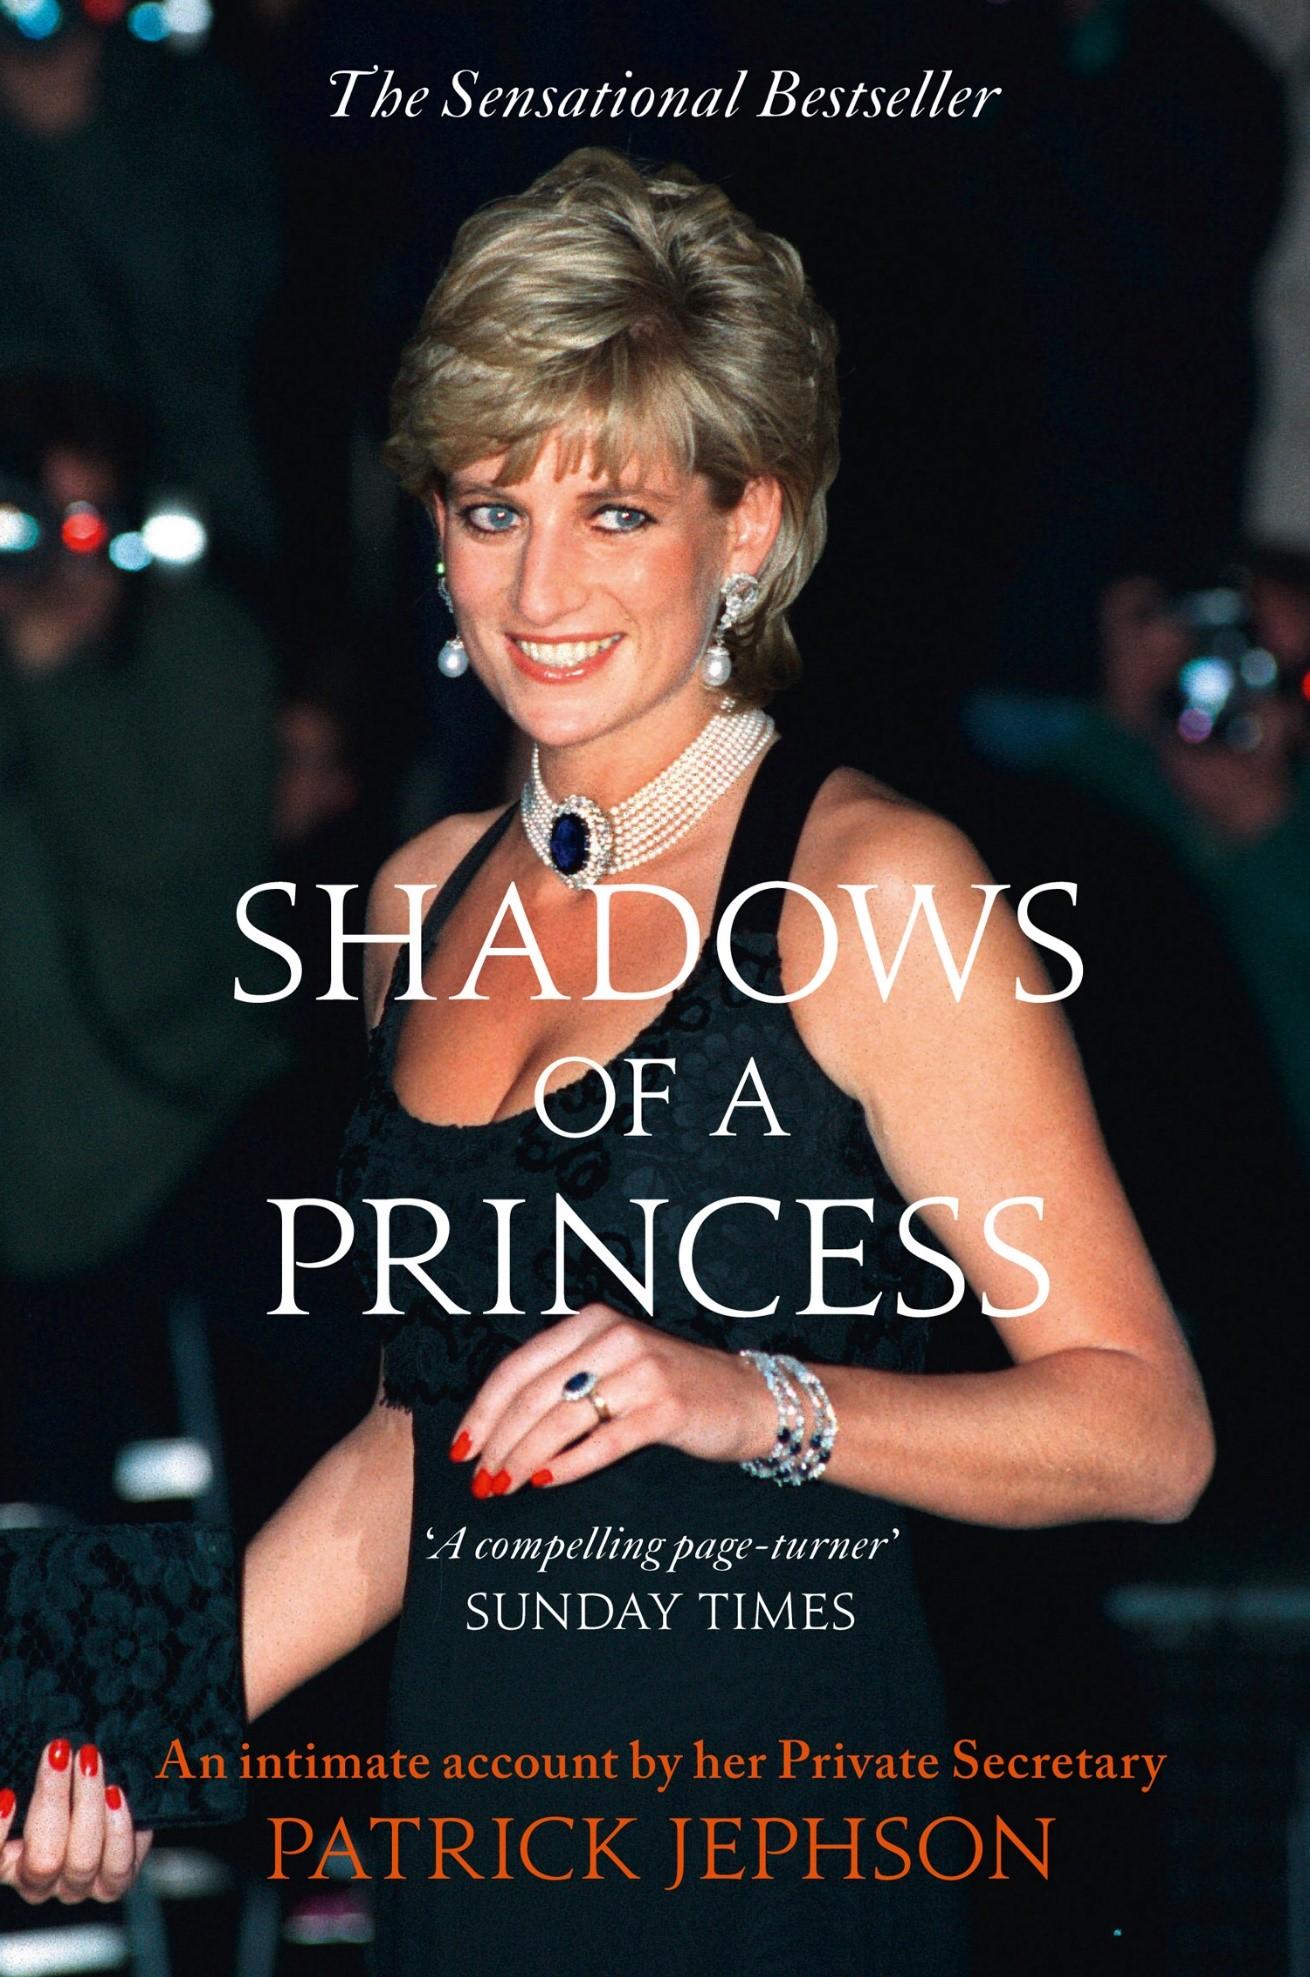 Shadows of a Princess